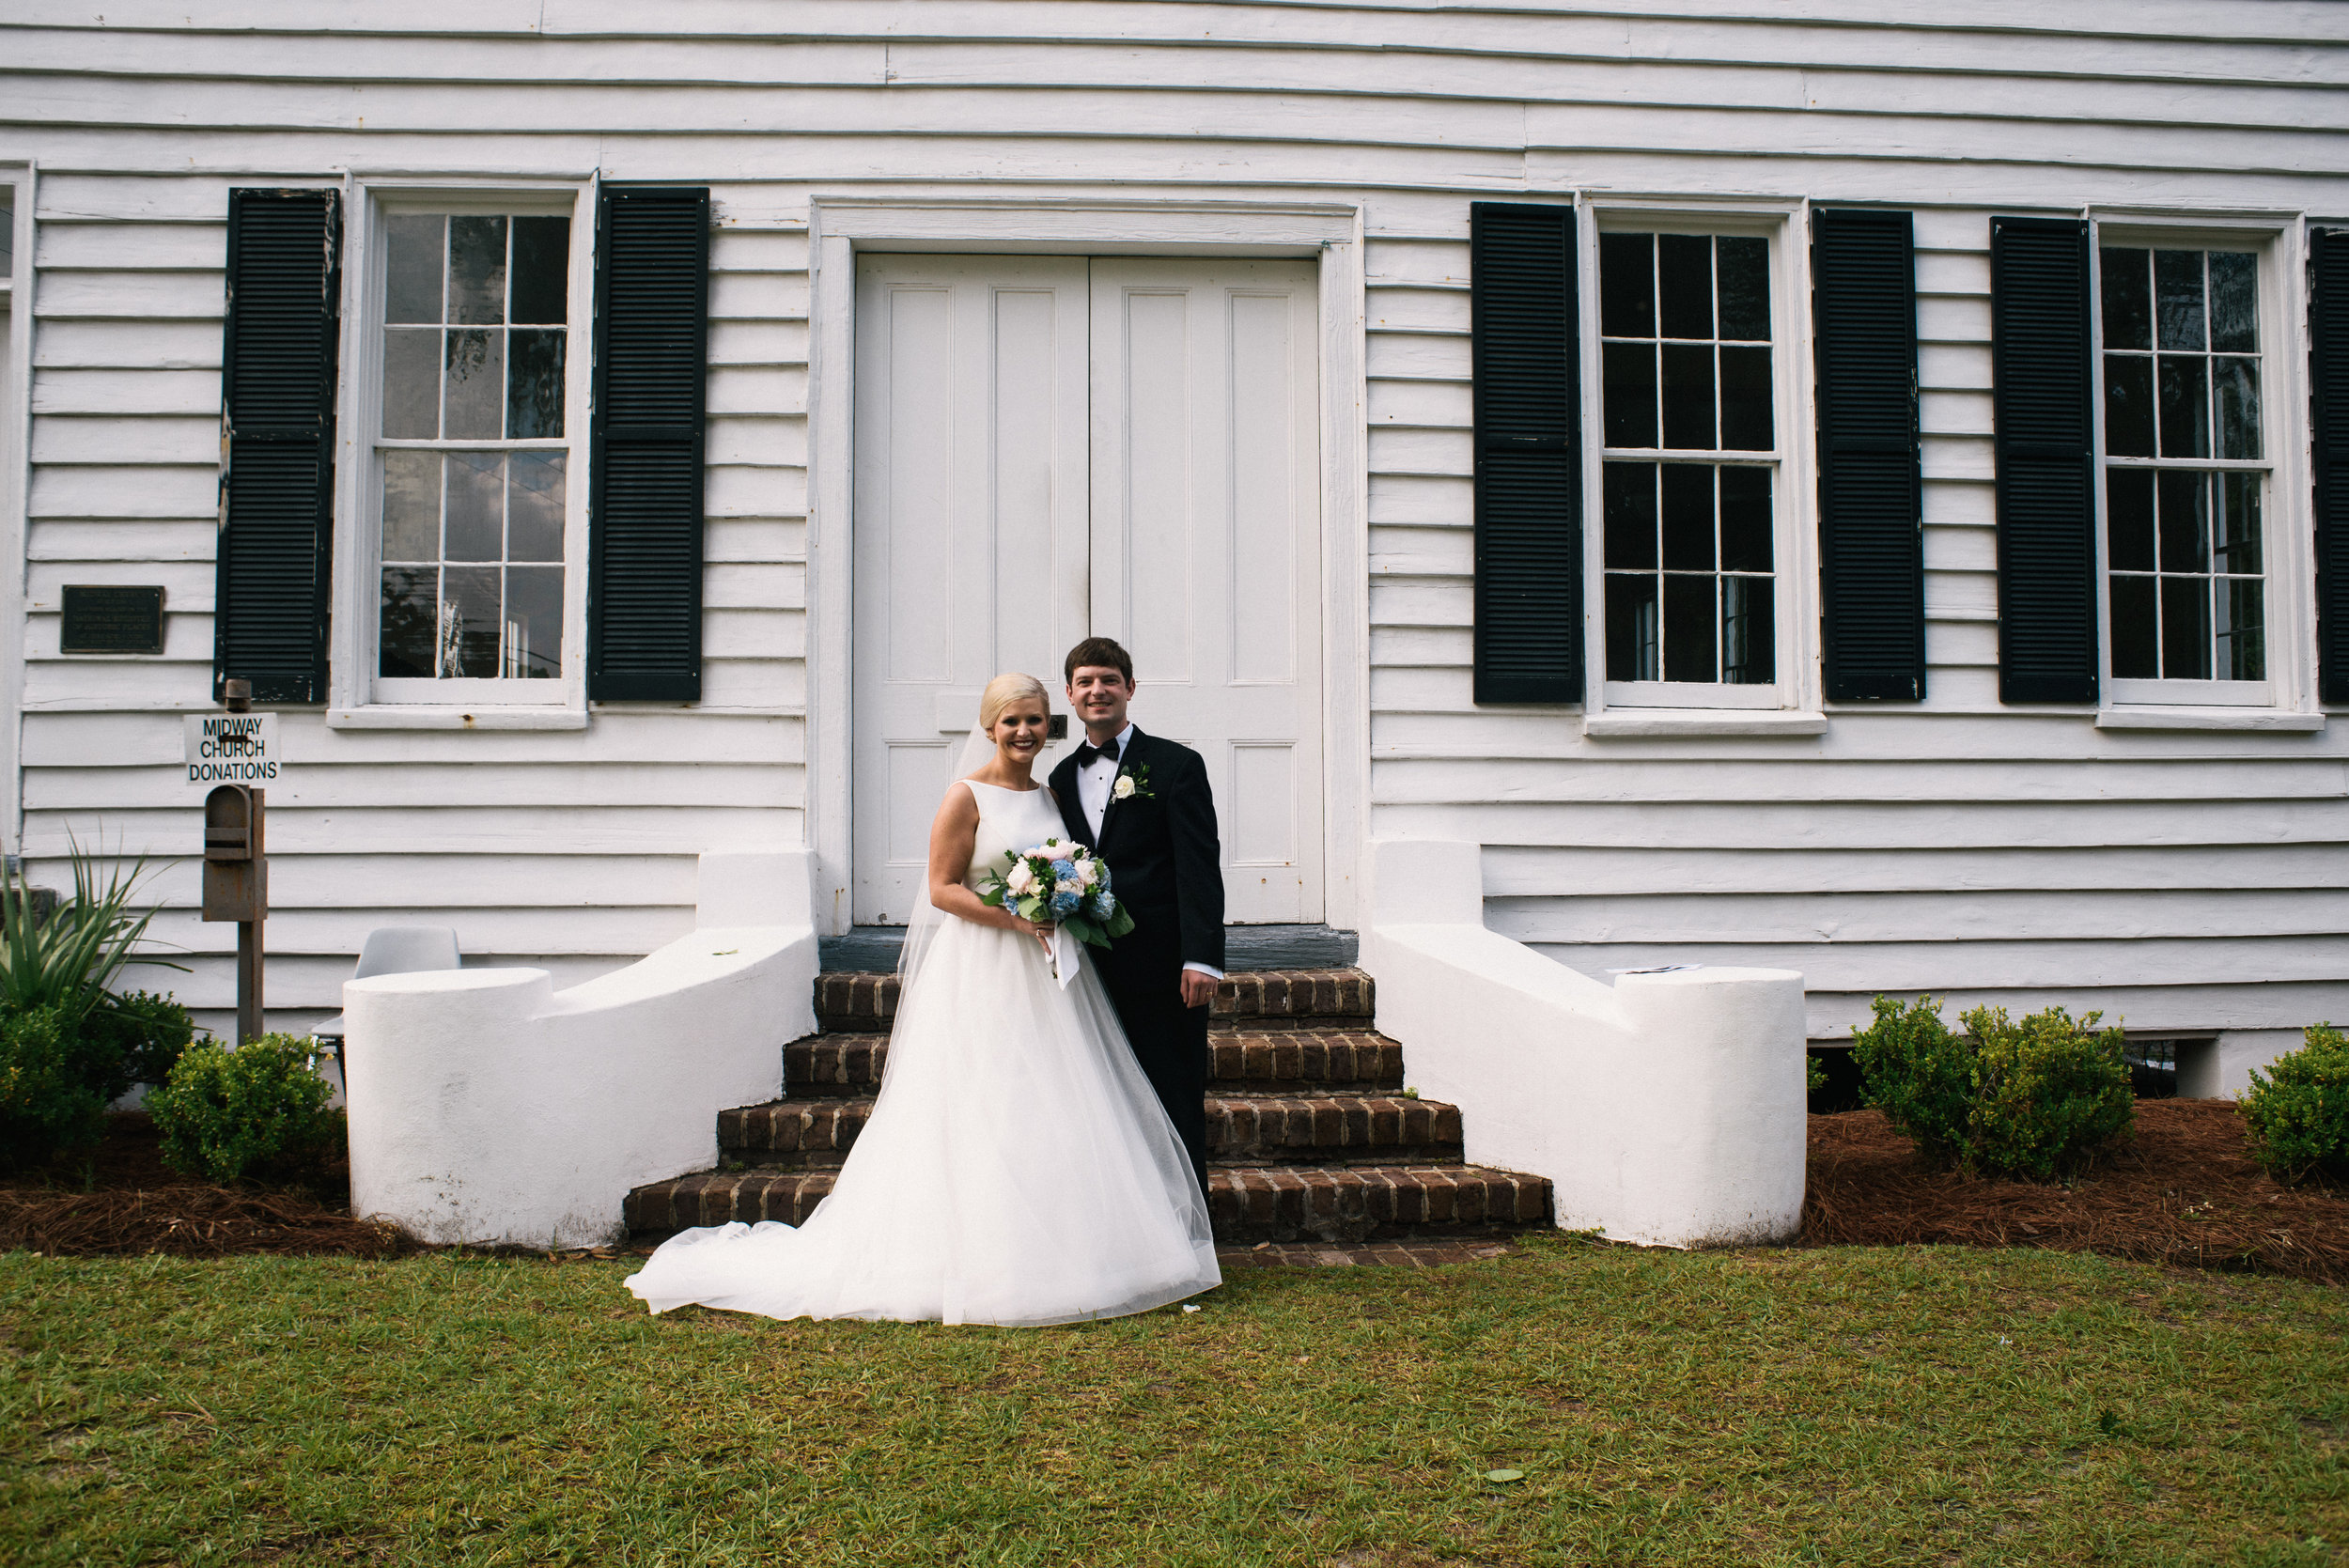 ali-and-jared-savannah-georgia-may-2017-wedding-meg-hill-photo-(445of760).jpg